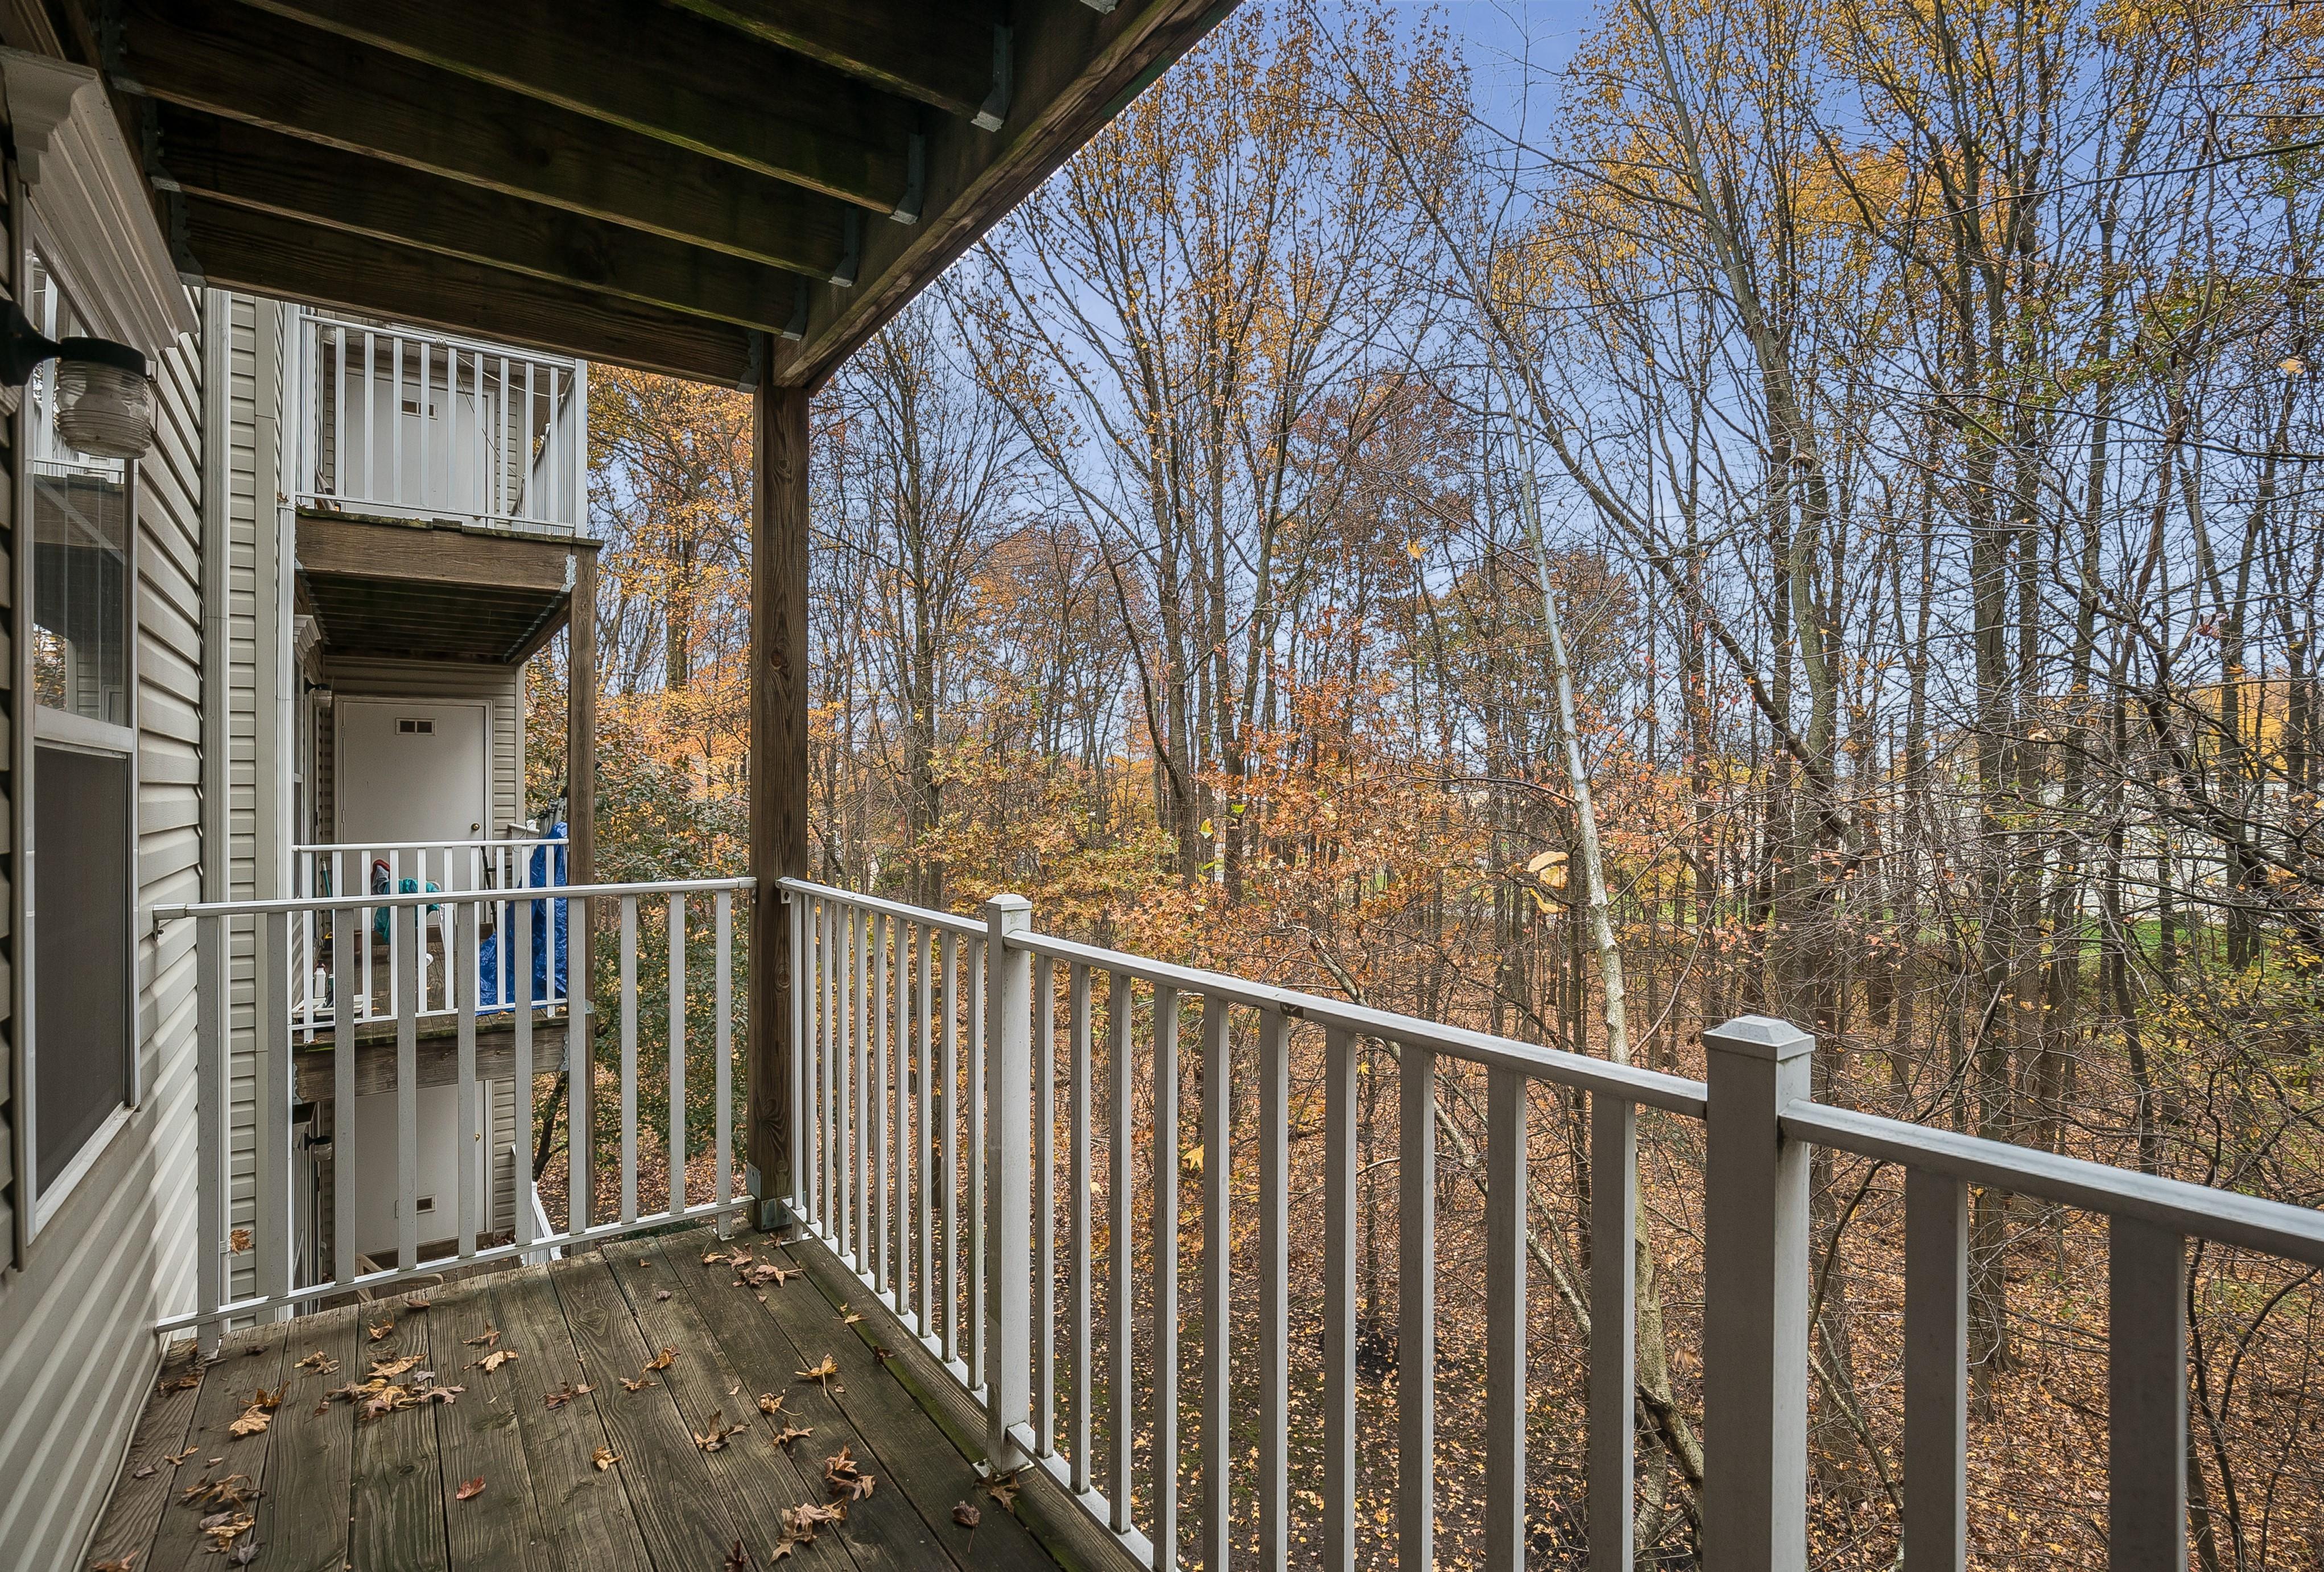 9-Short_Term_Housing_South_Plainfield_724_Deck View